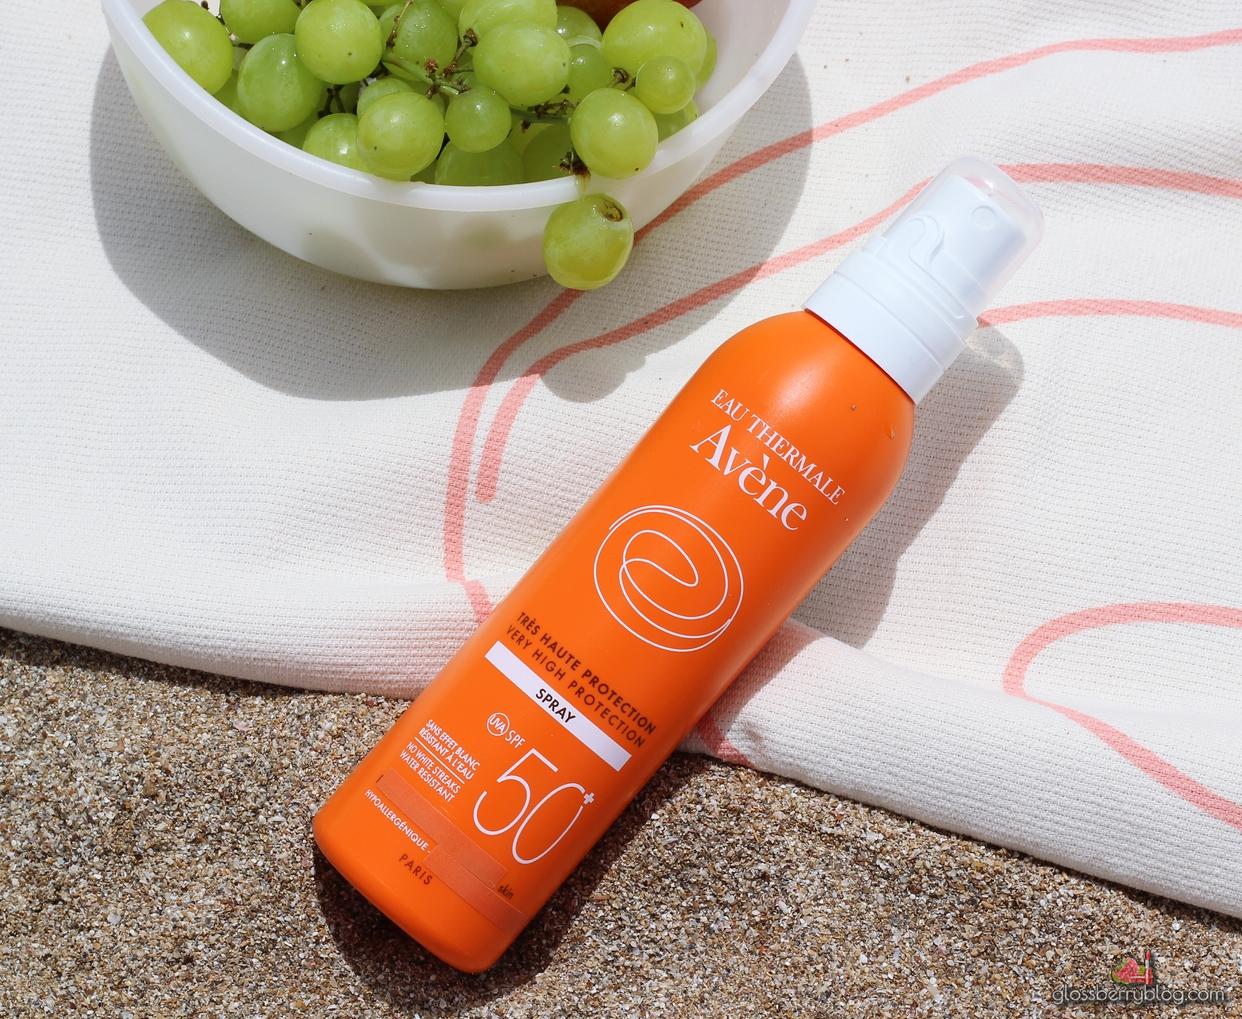 AVENE - Very High Protection Spray SPF50 אוון מקדם הגנה מהשמש מסנן קרינה גלוסברי בלוג איפור וטיפוח